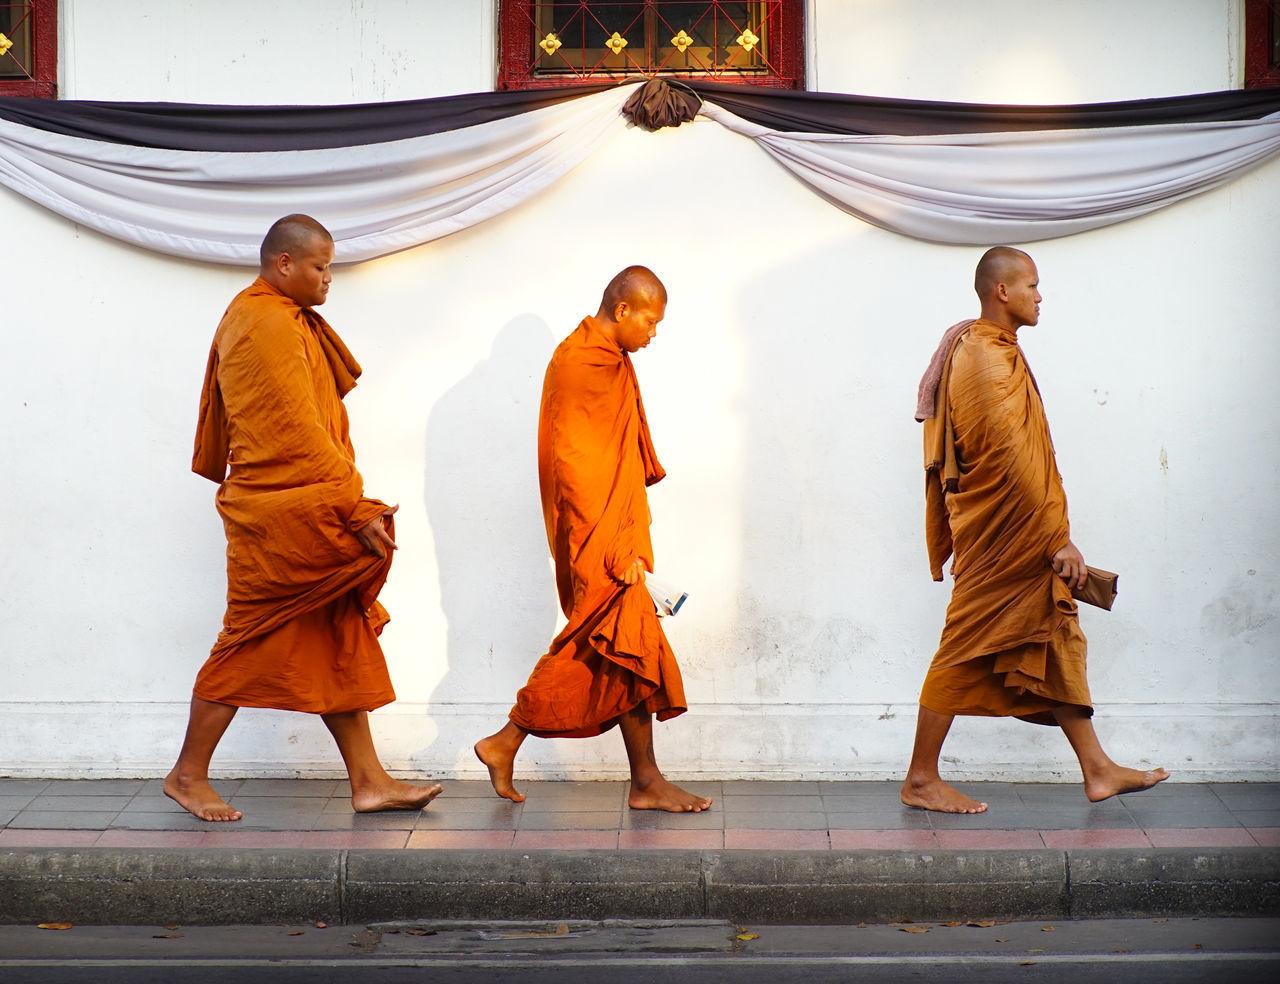 Enlightening path Bangkok Buddhism Buddhist Monks City City Life Monks Orange Outdoors Religion Saffron Robes Spirituality Street Street Photography Temple Wall Walking